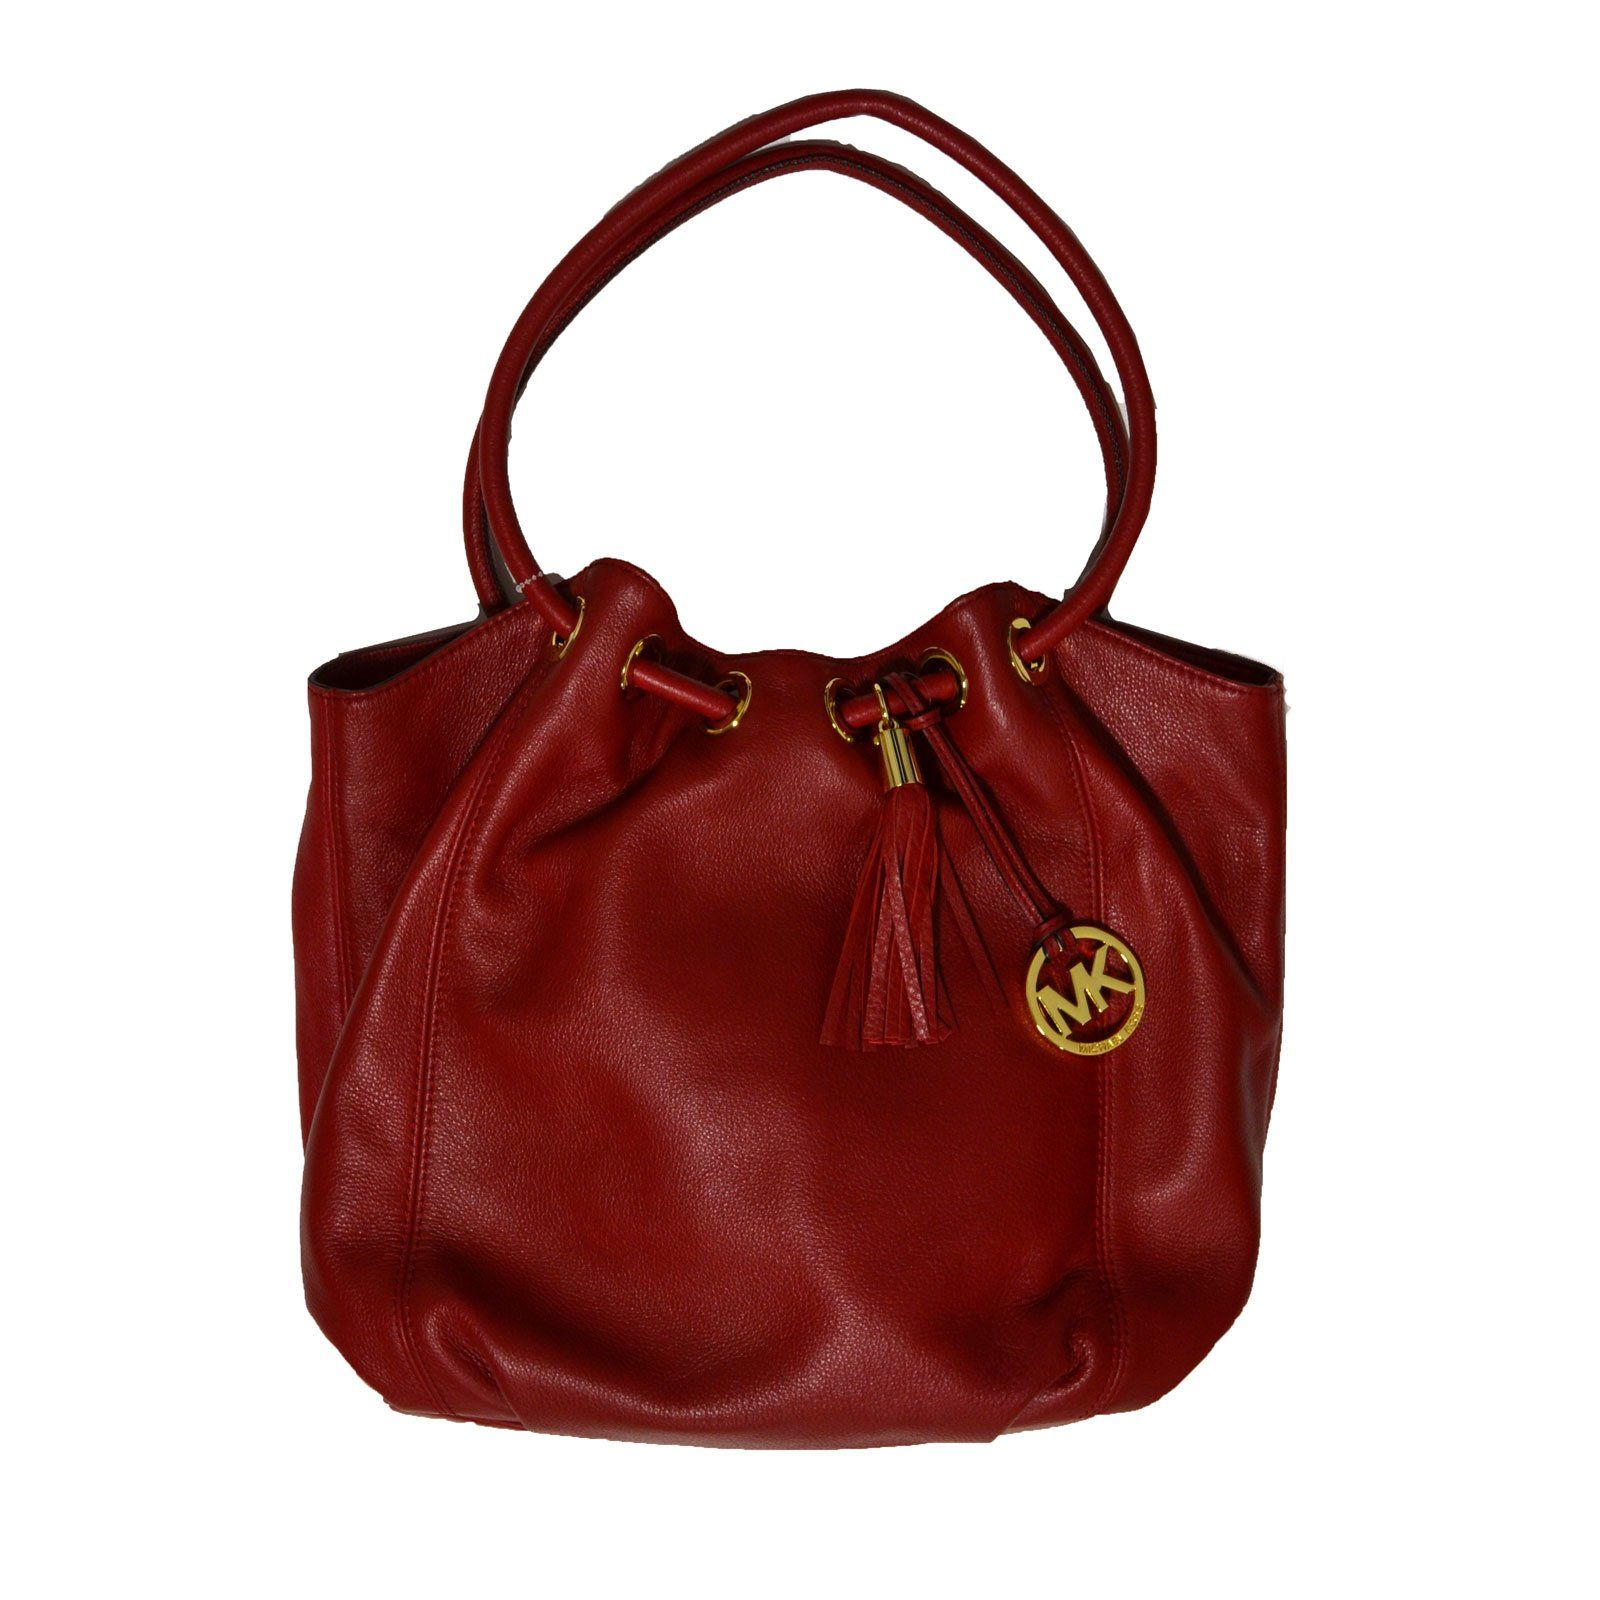 cc65ebcdde5a Michael Kors Purse Scarlet Leather Large Ring Tote Red | Handbags ...